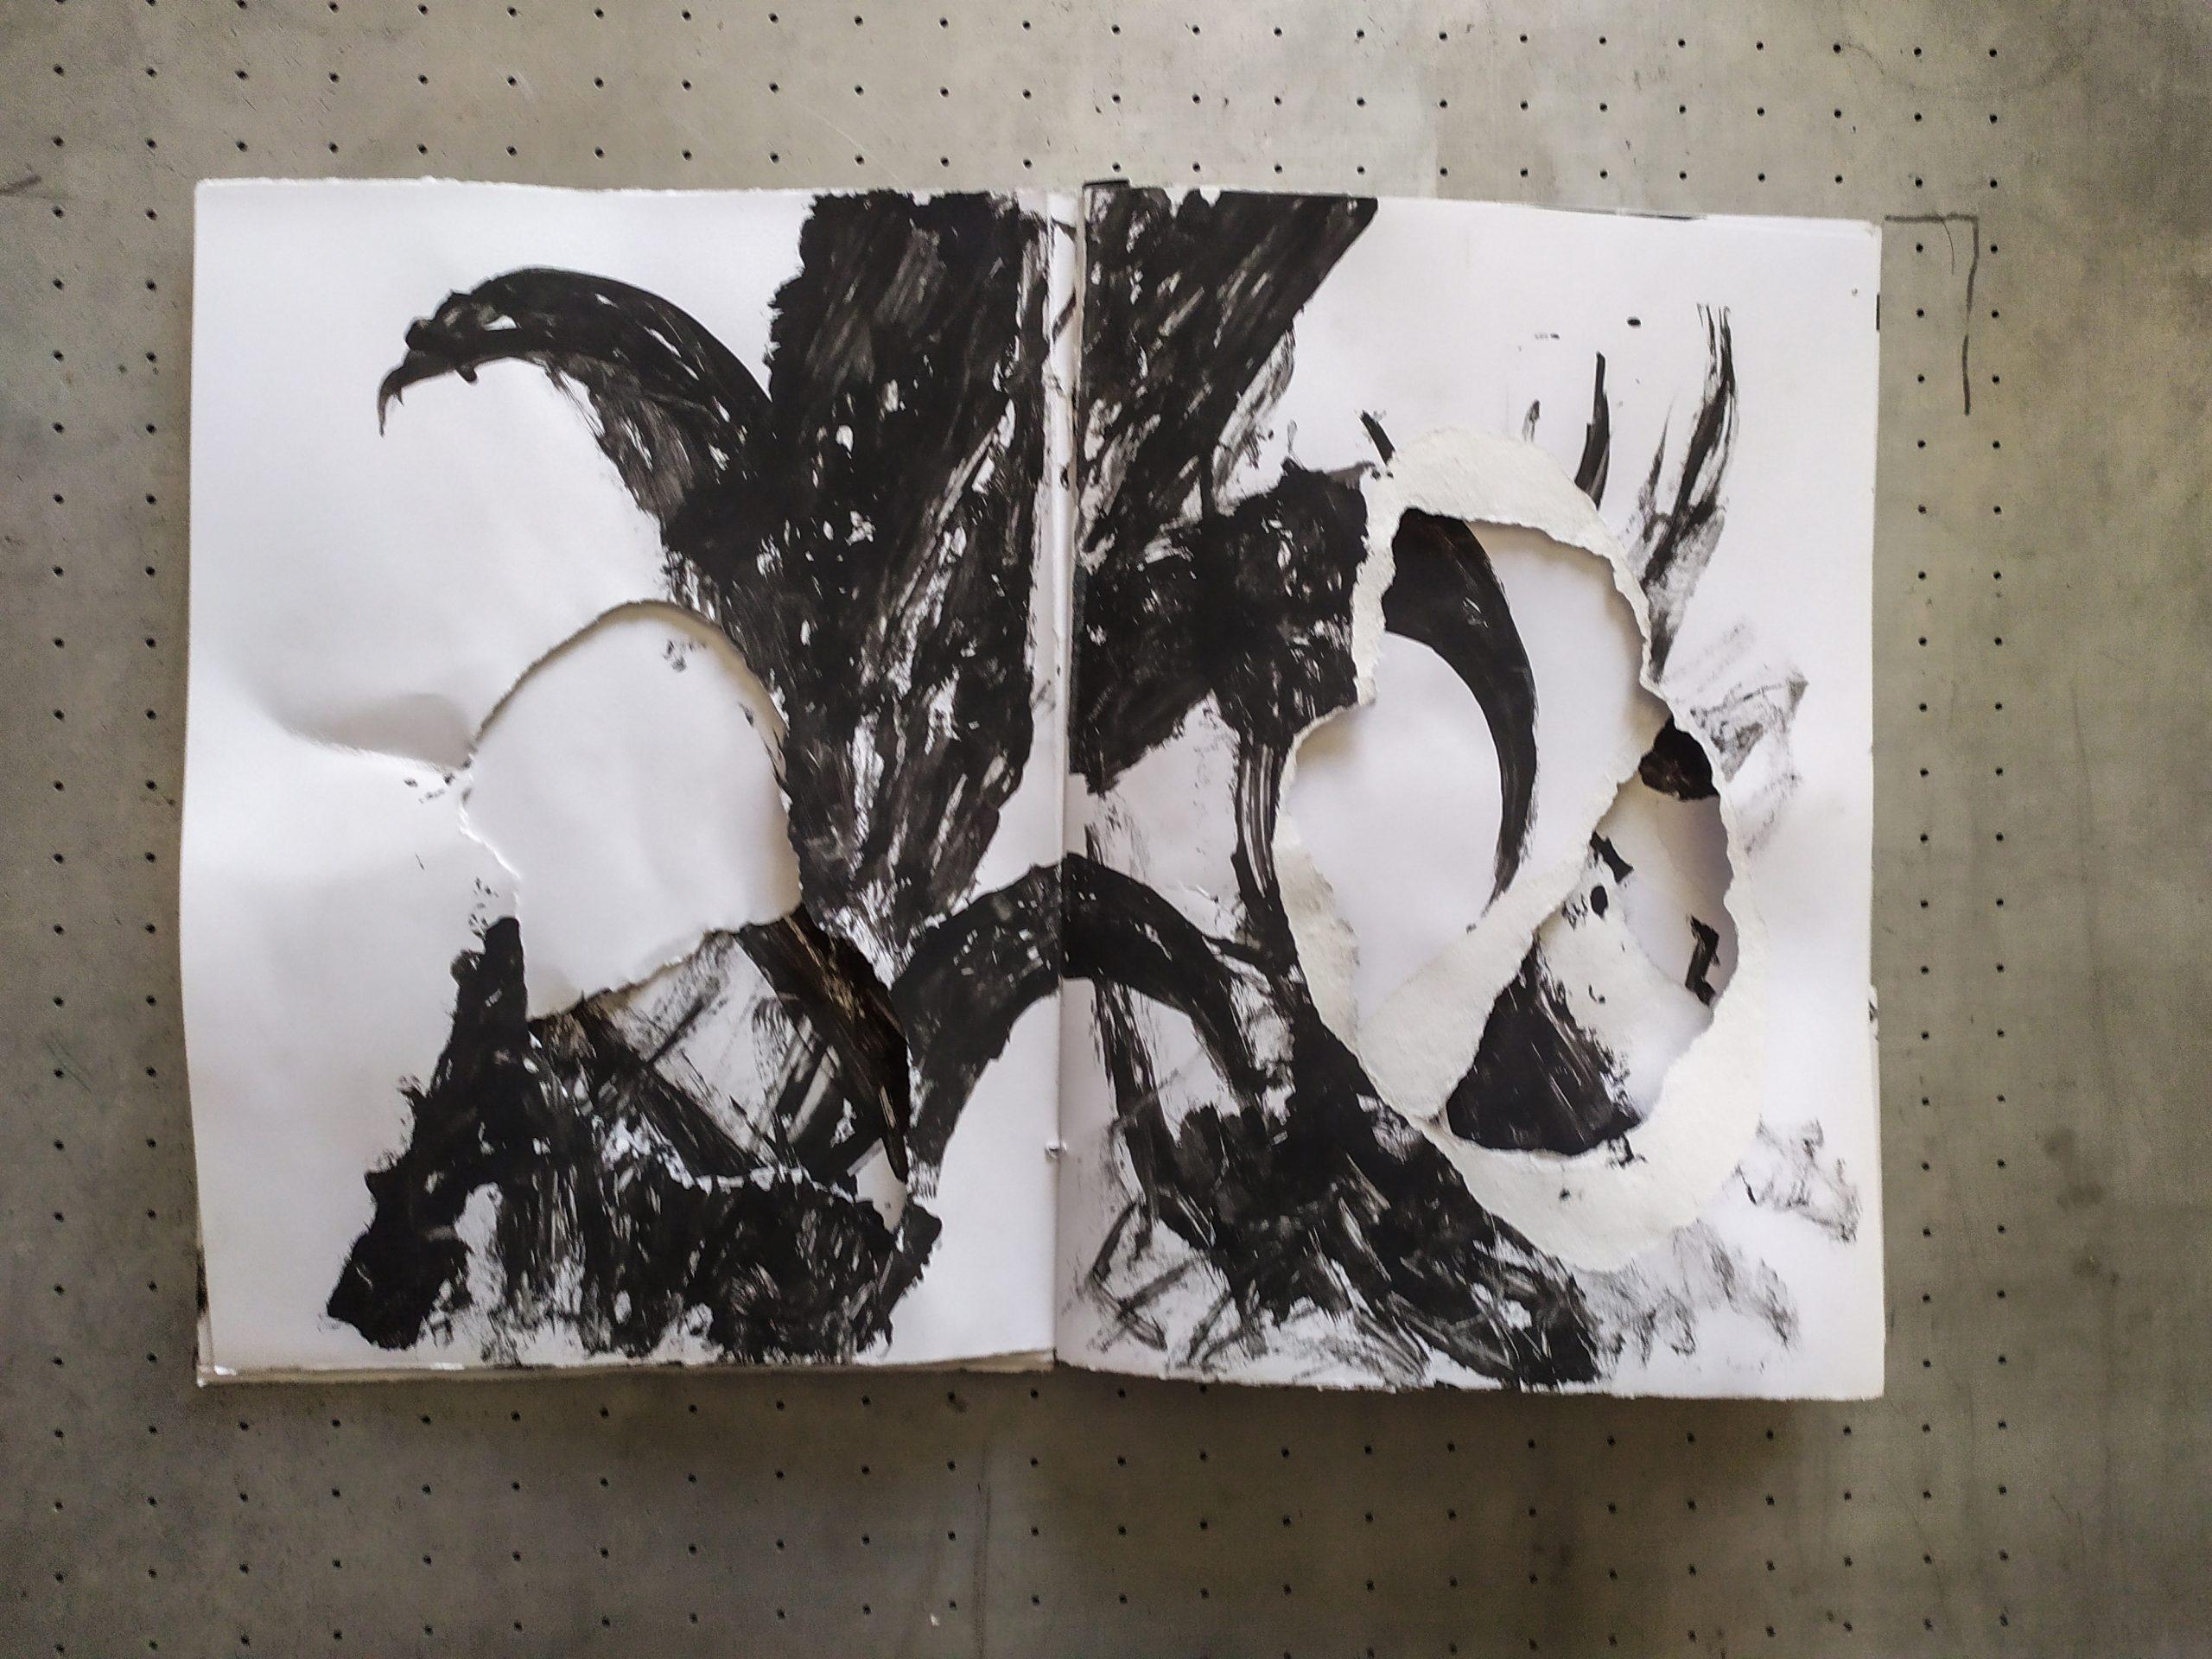 artistbook-sep-2021-carloszorromono-12